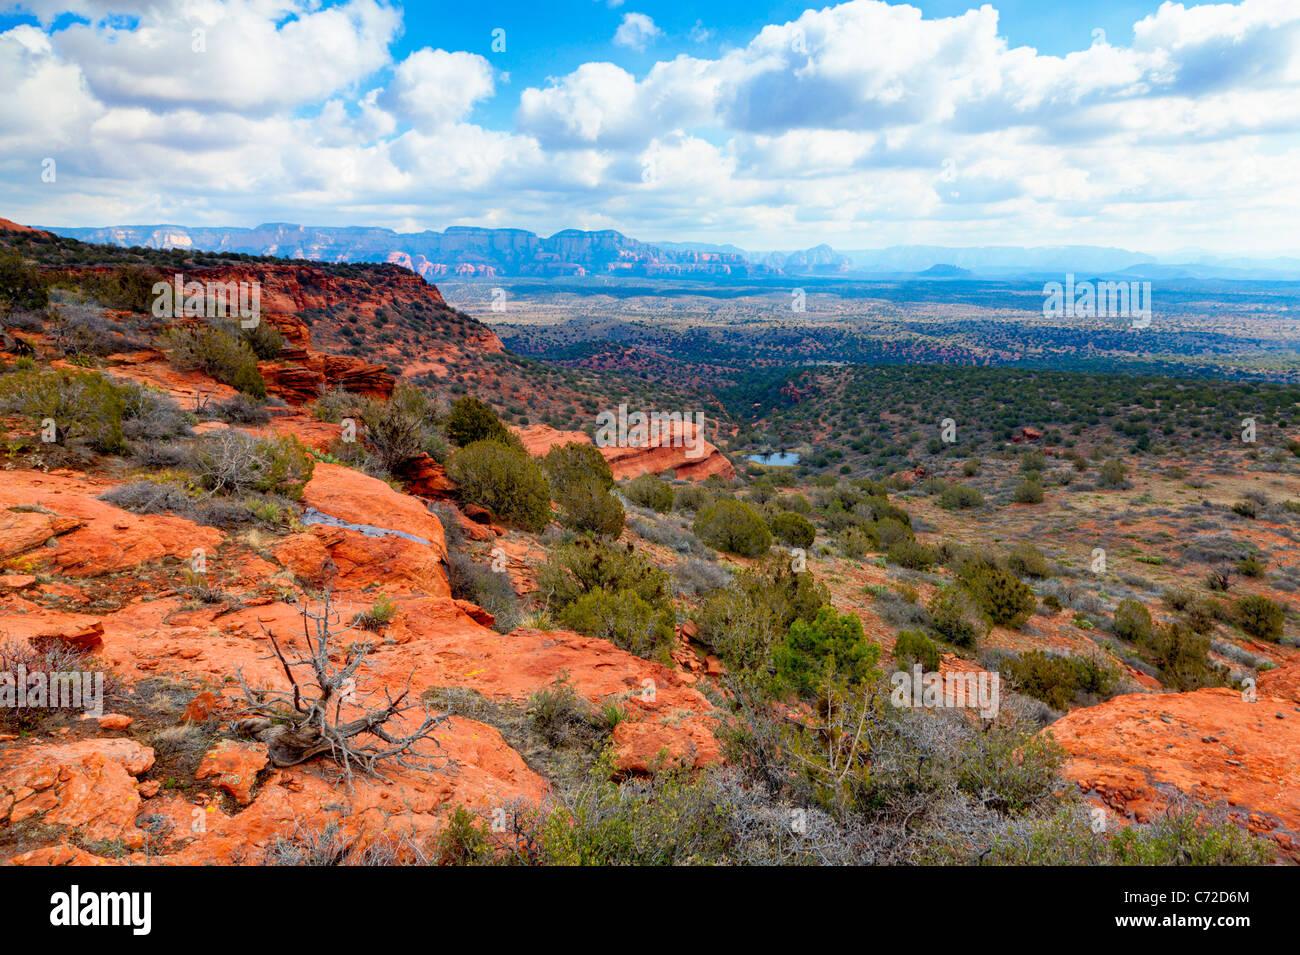 Desert landscape near Sedona Arizona - Stock Image